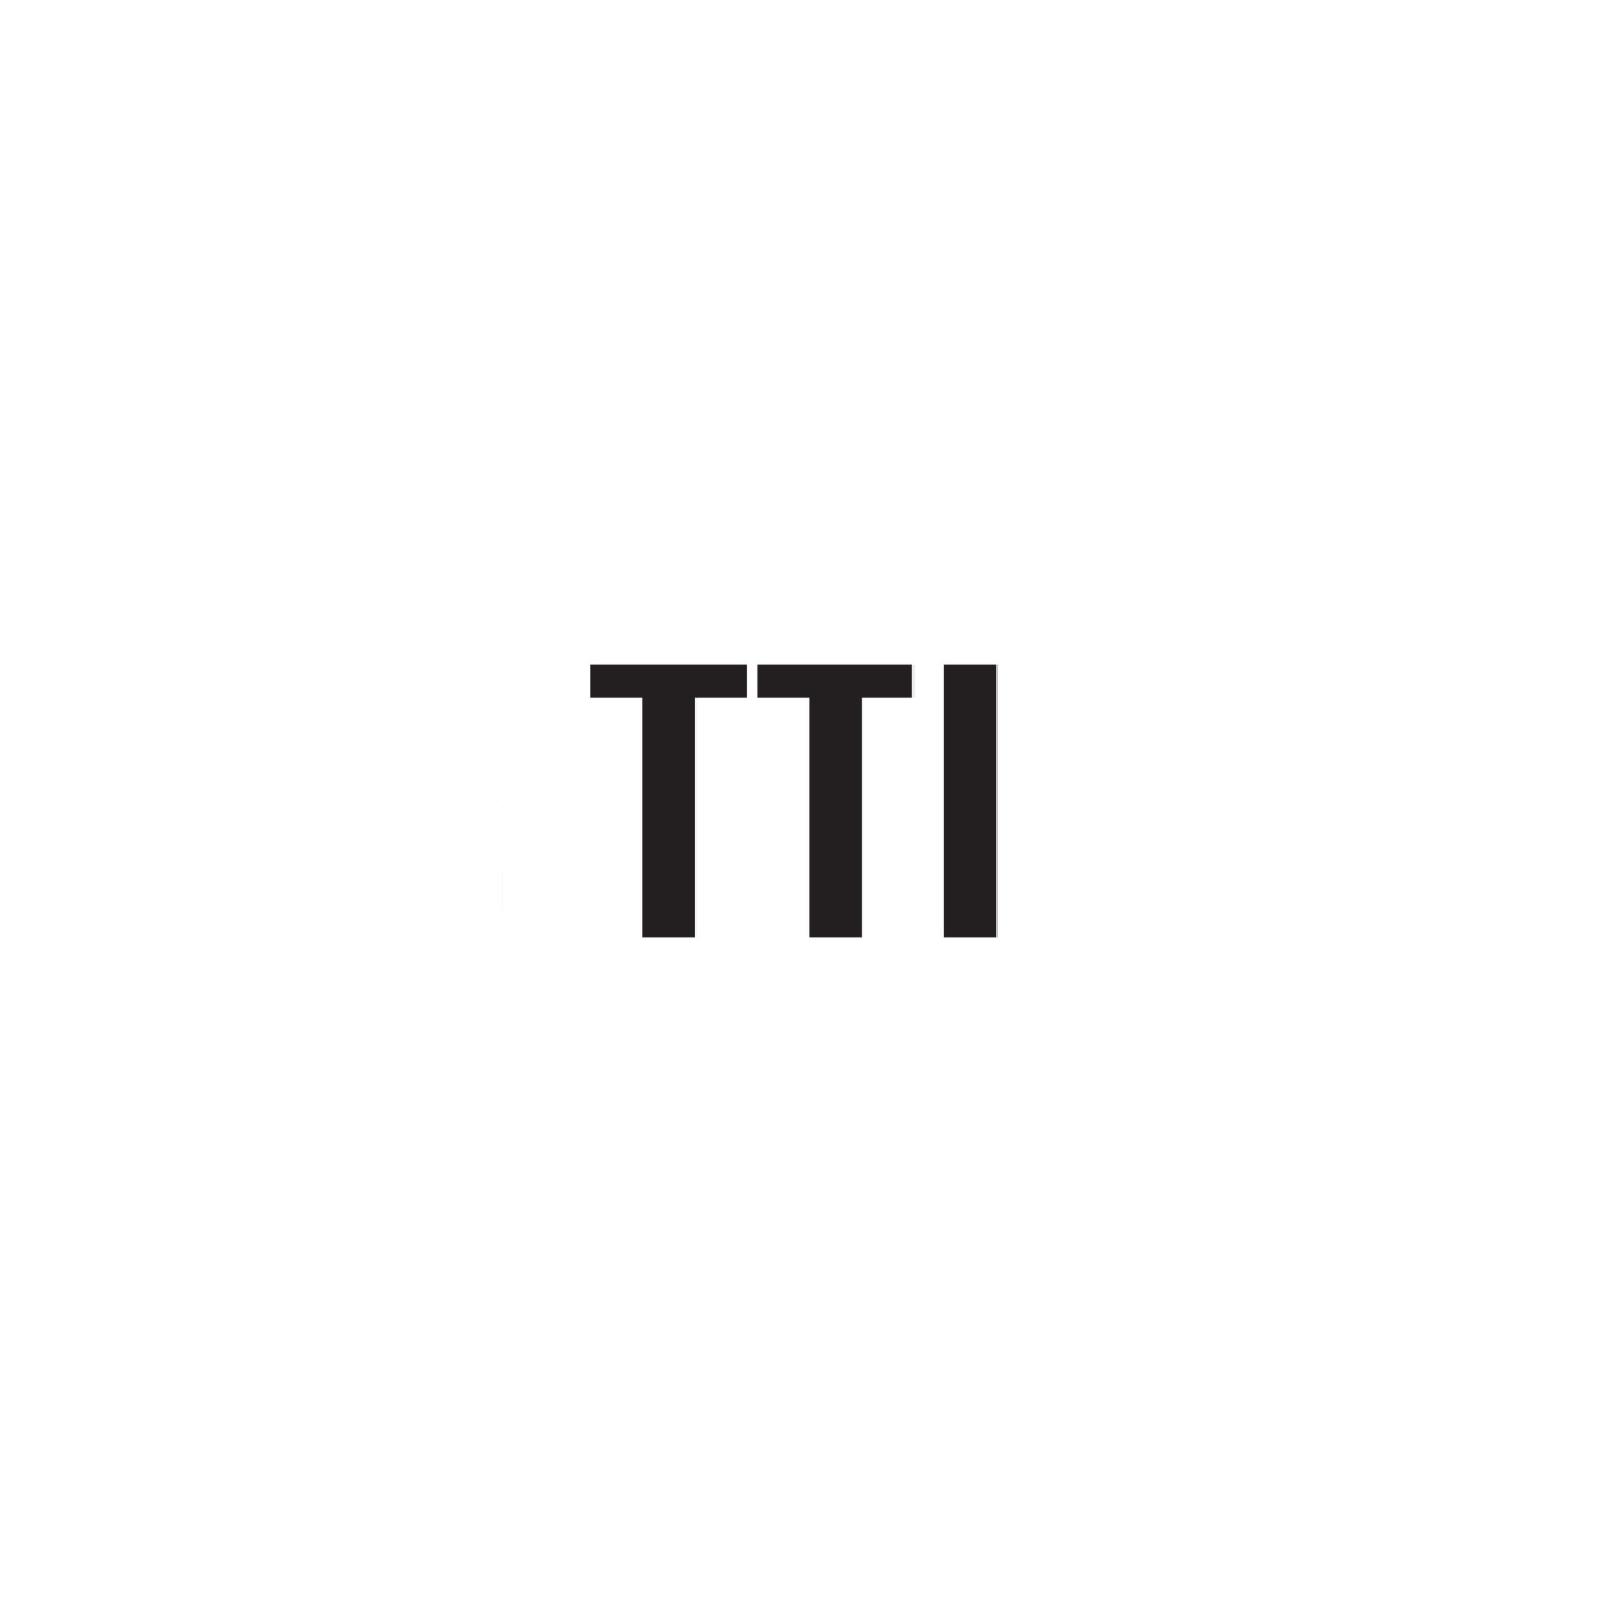 Тонер KYOCERA TK-160/TK-170/TK-1140 1кг TTI (TSM-T141-A-1)